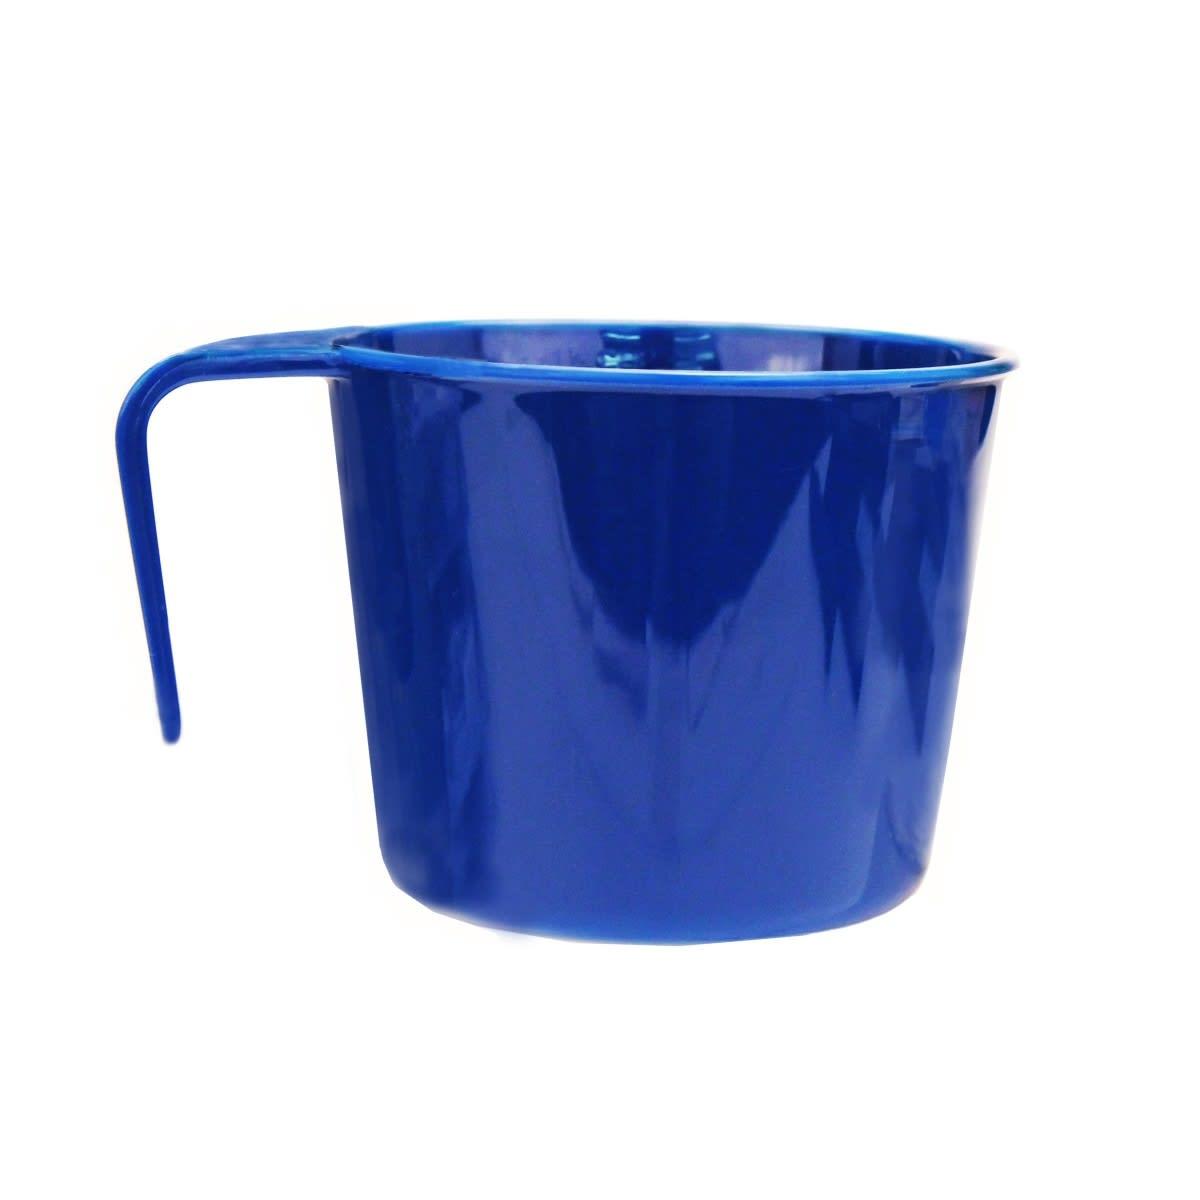 Coghlan's 350ml Cup